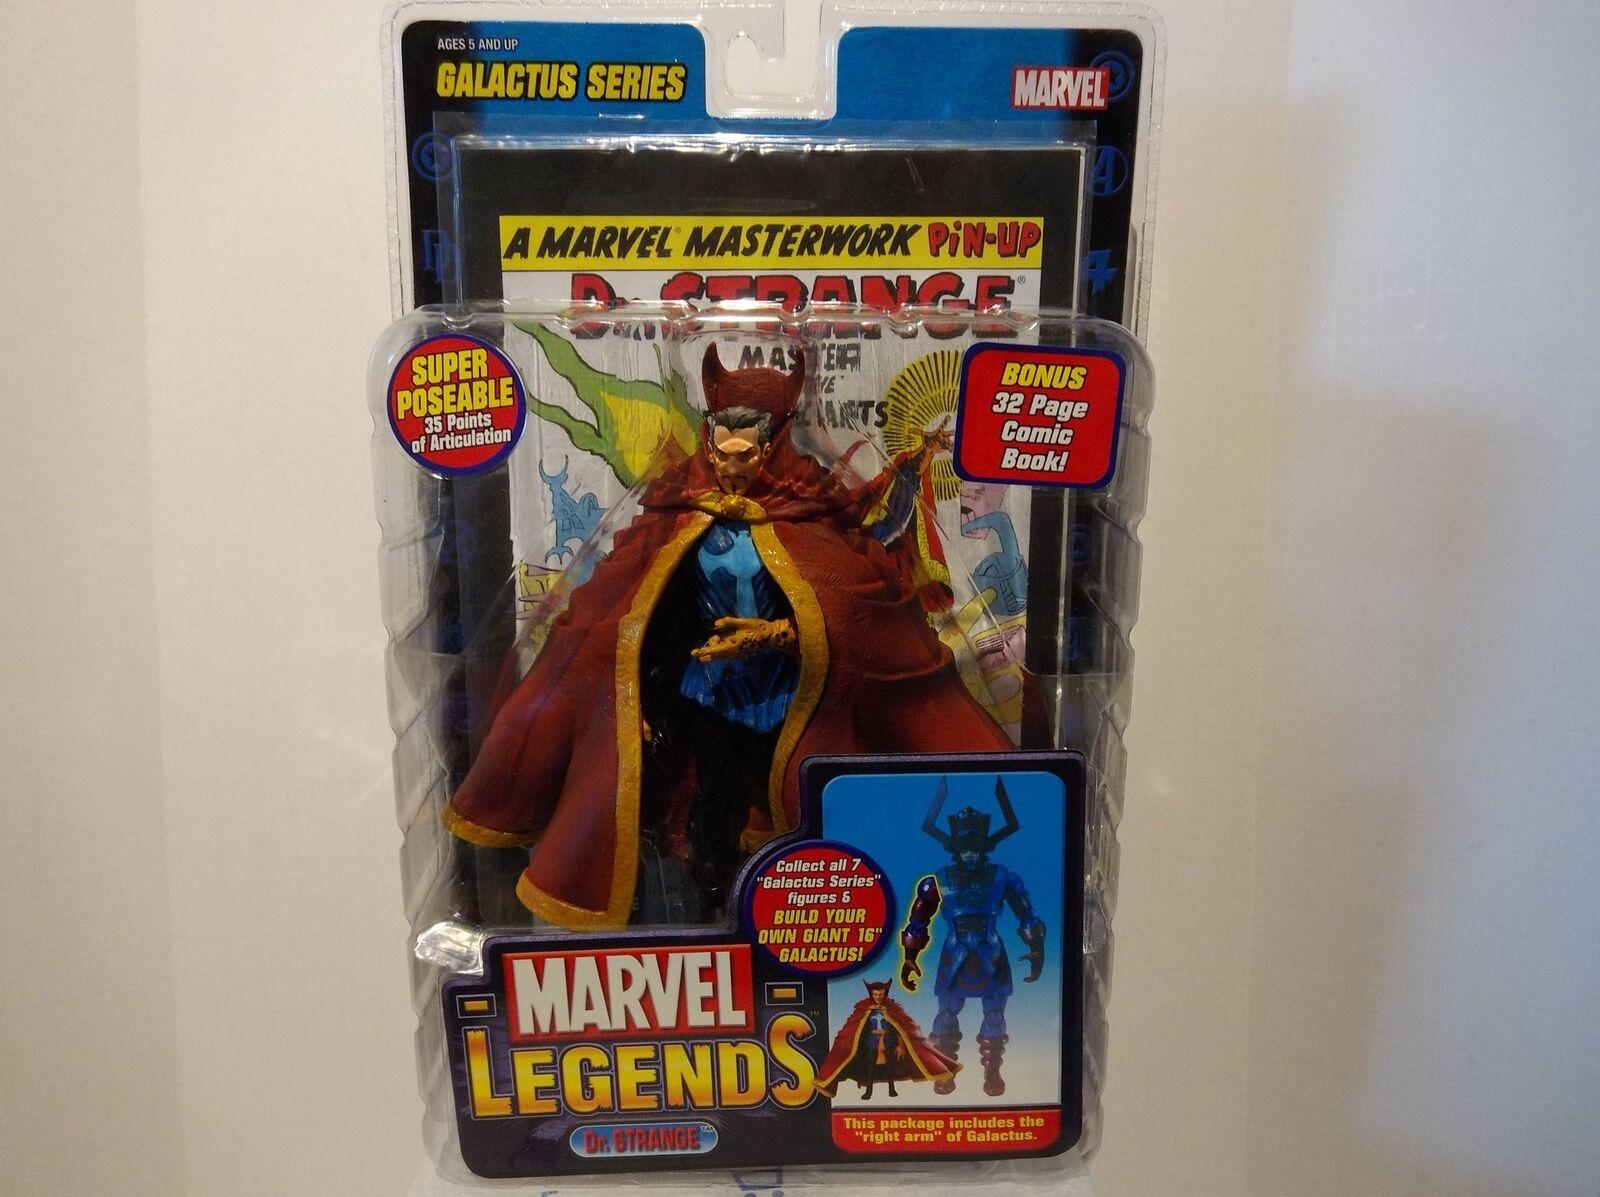 Marvel Legends - Dr Strange with Galactus Piece